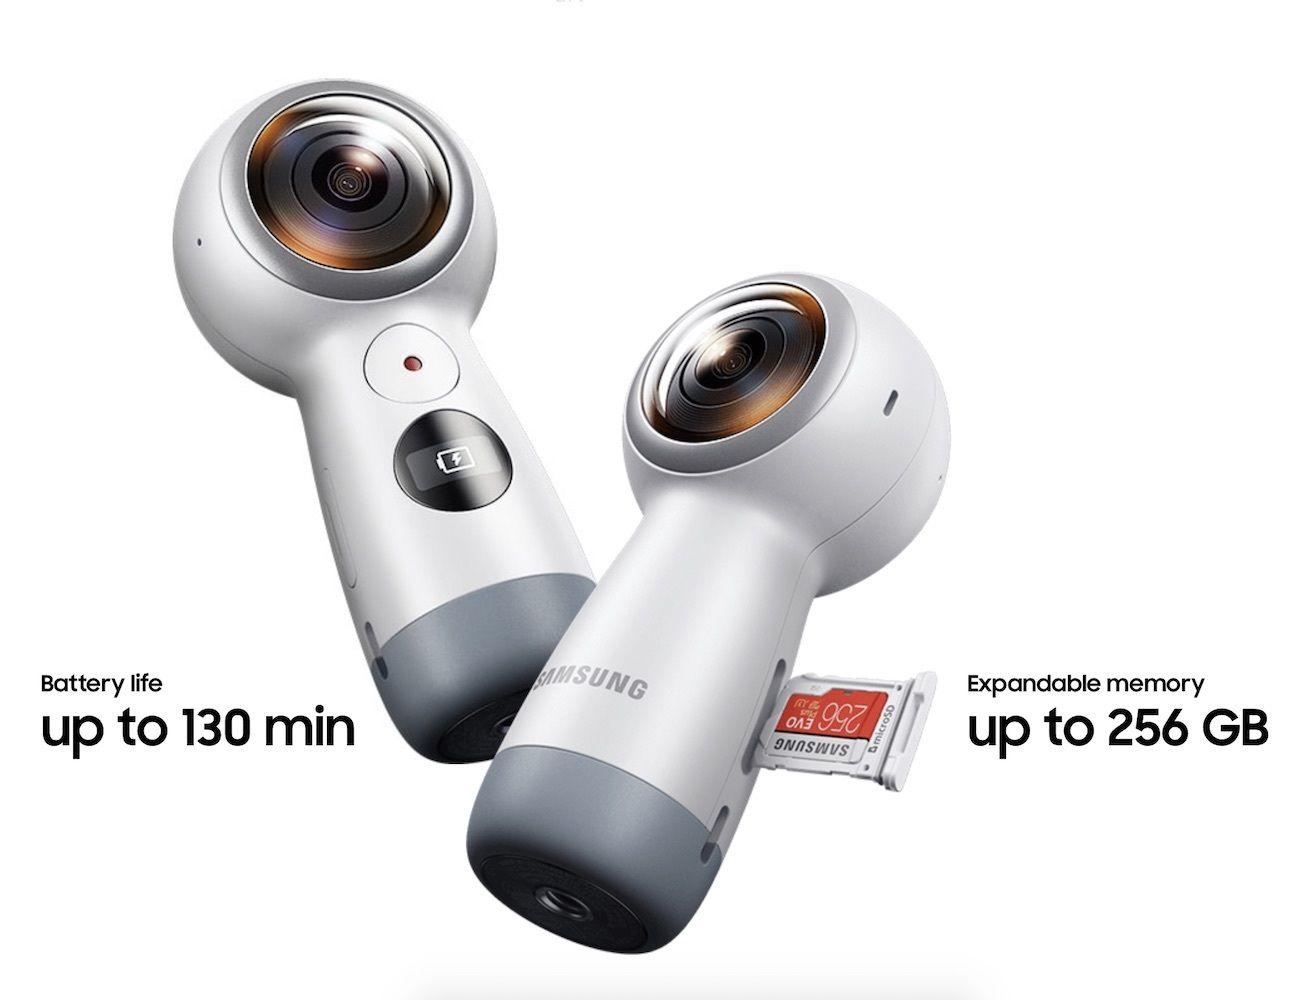 samsung gear 360 4k camera review the gadget flow. Black Bedroom Furniture Sets. Home Design Ideas